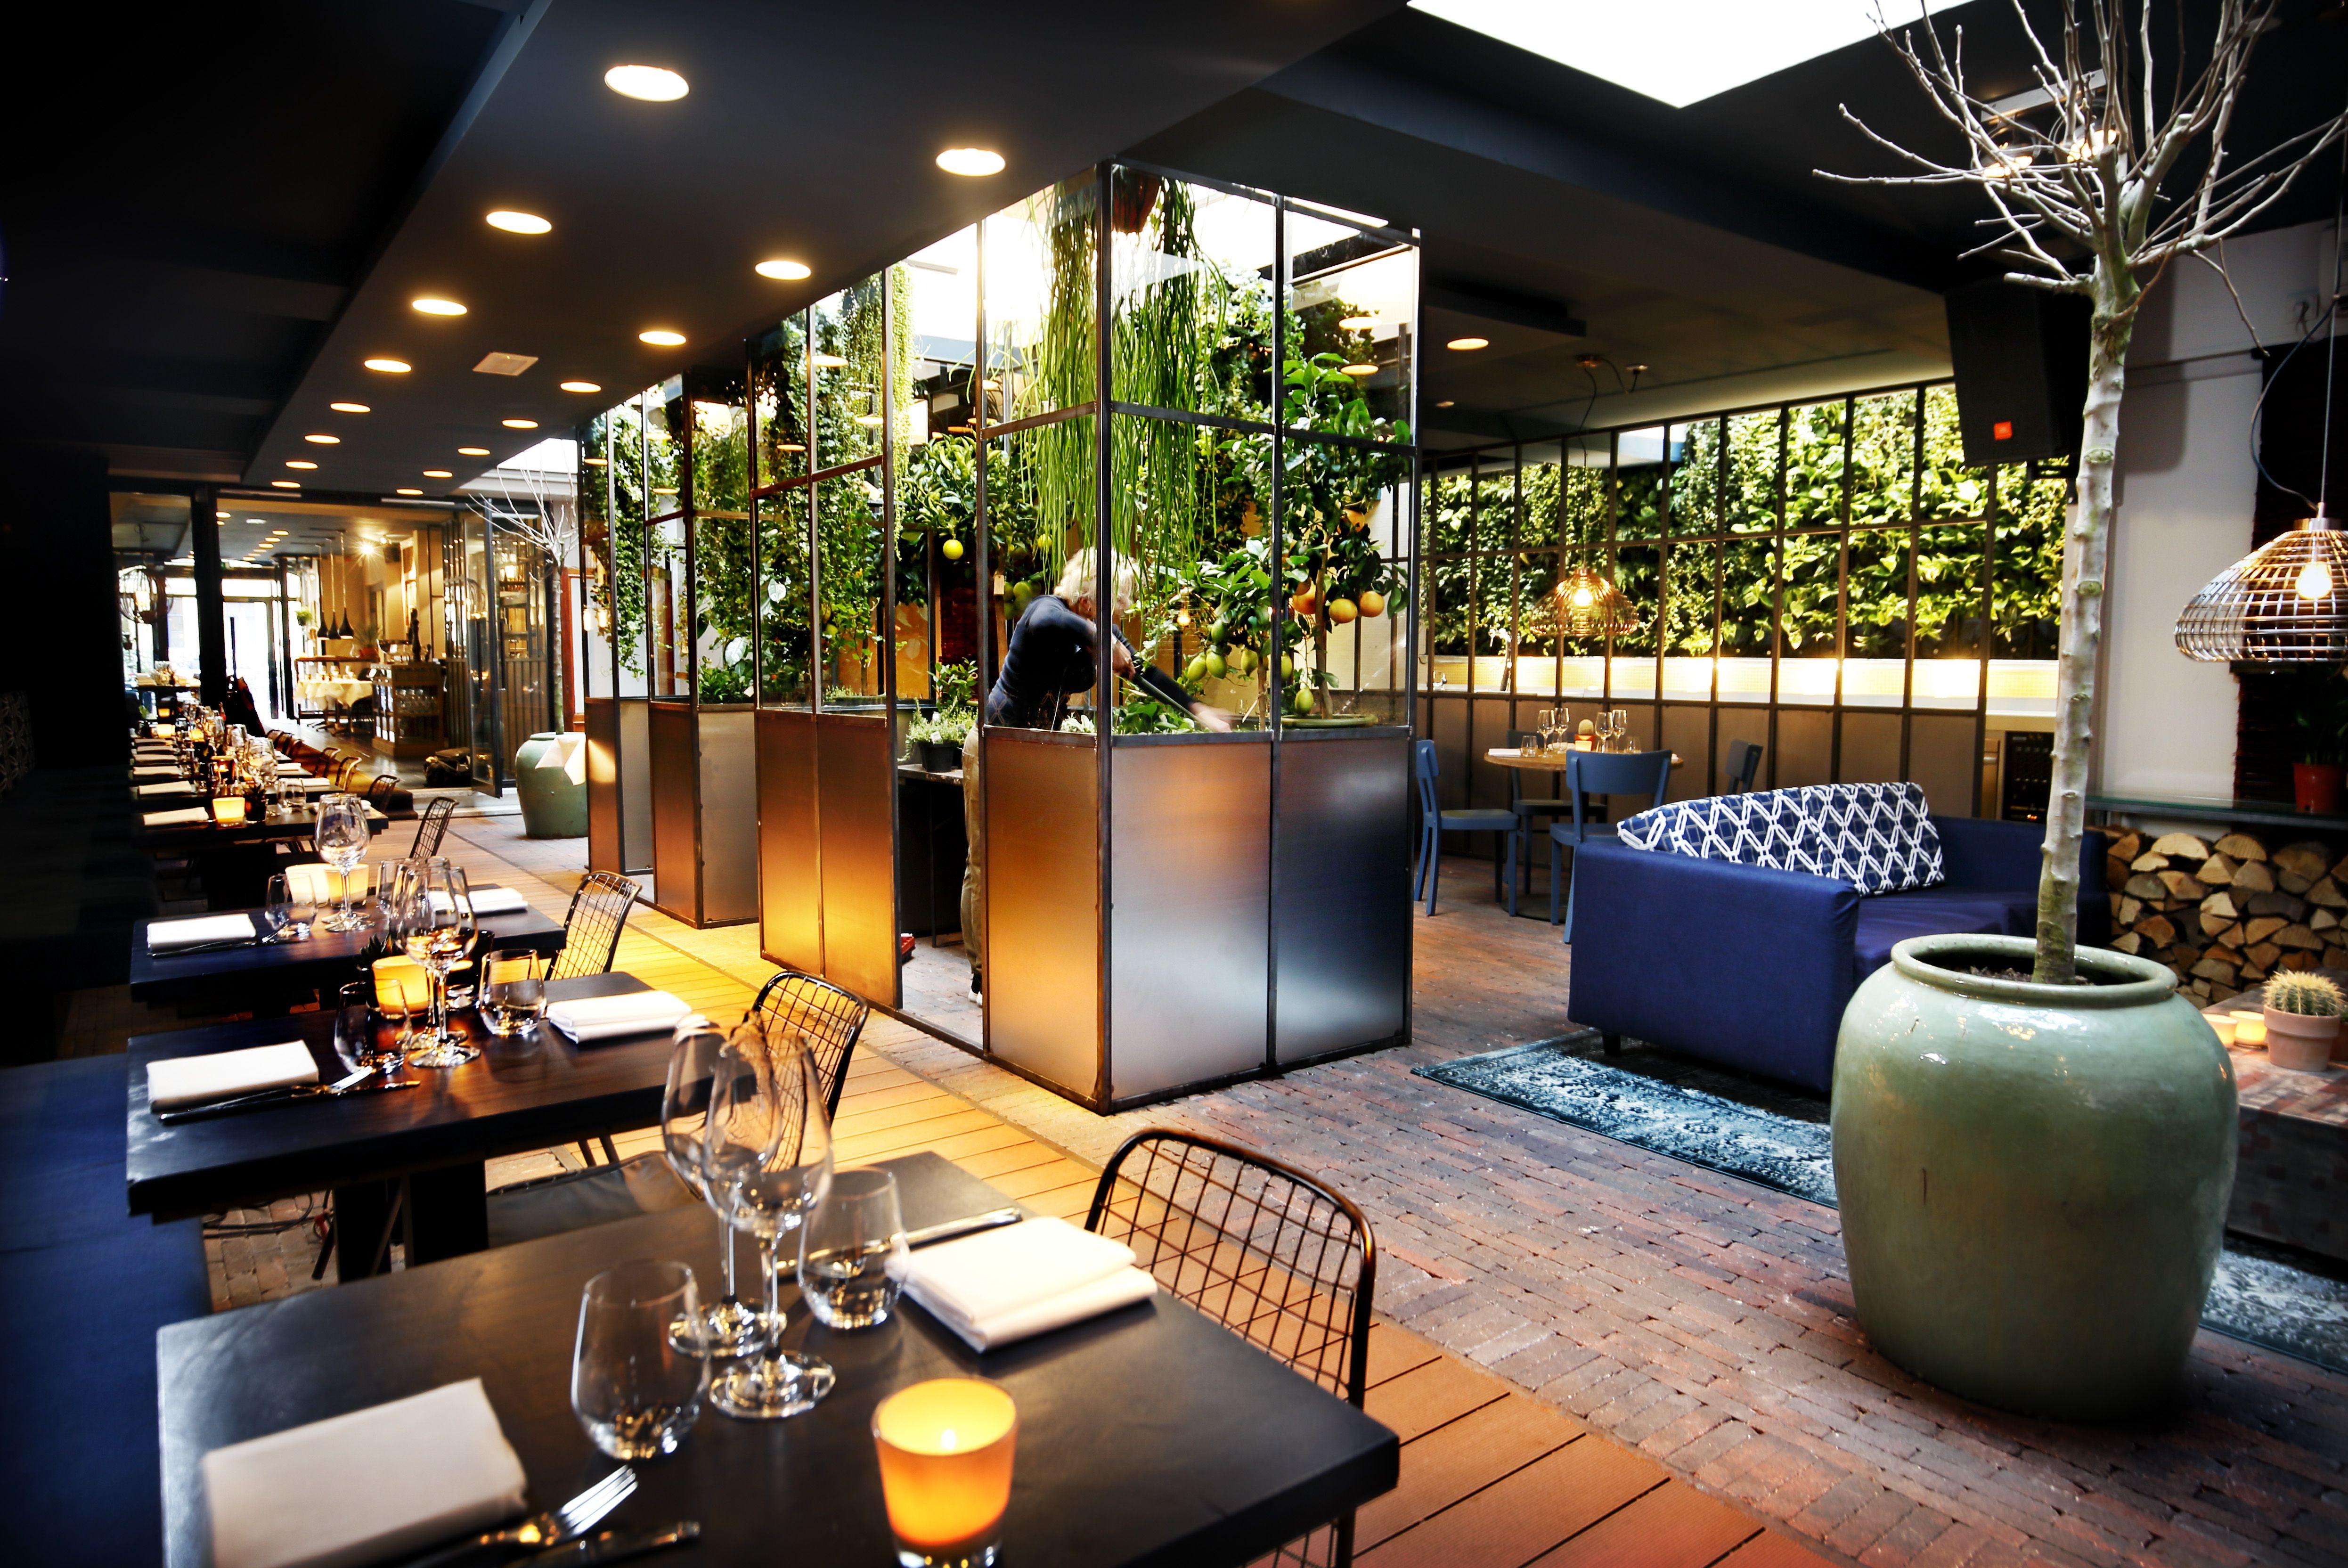 Fotoalbum le jardin utrecht entree magazine i 39 d eat for Le jardin bar